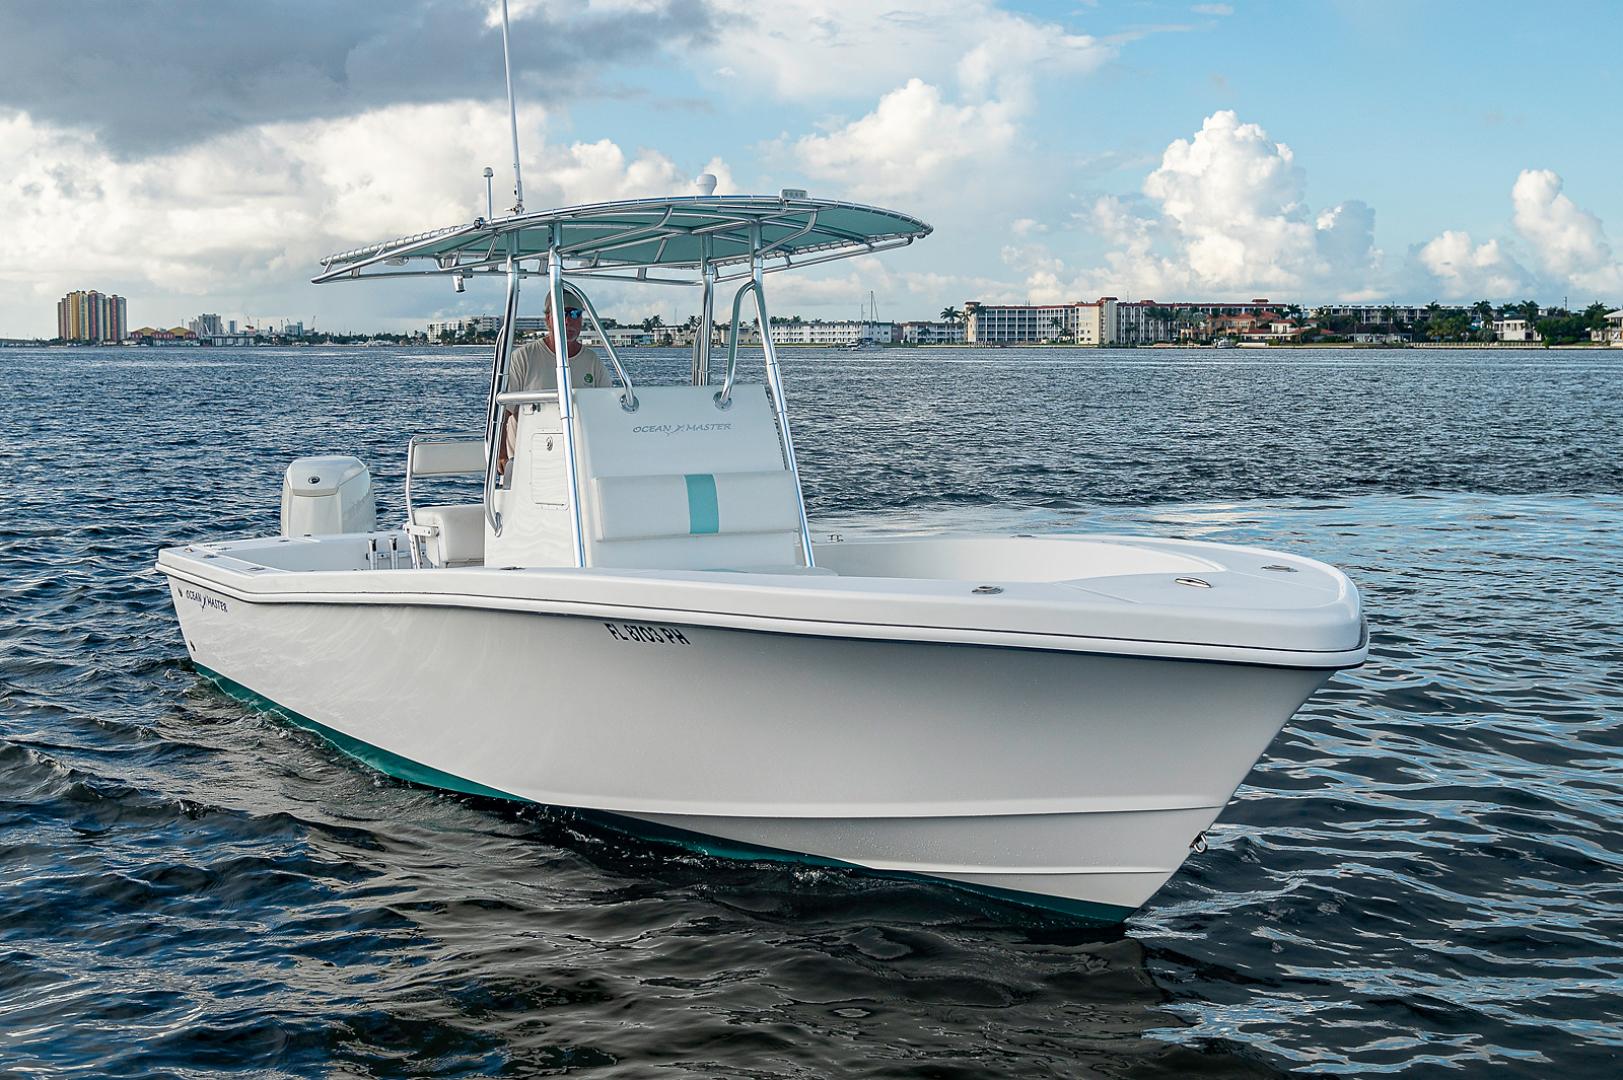 Ocean Master 2013-27 Ocean Master Palm Beach-Florida-United States-27 Ocean Master-1501374 | Thumbnail